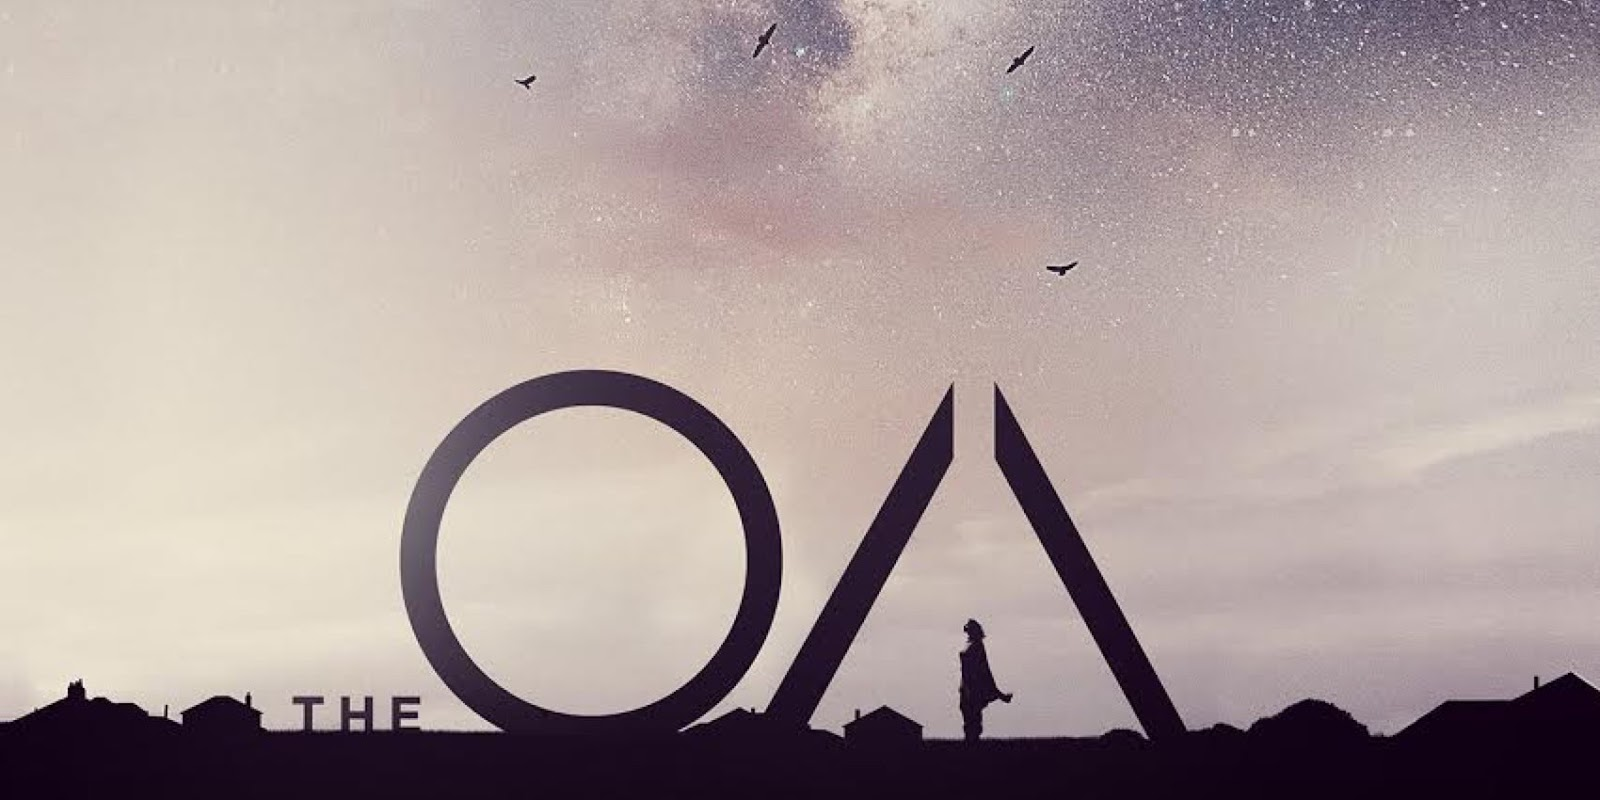 Netflix cancela la serie The OA después de dos temporadas emitidas